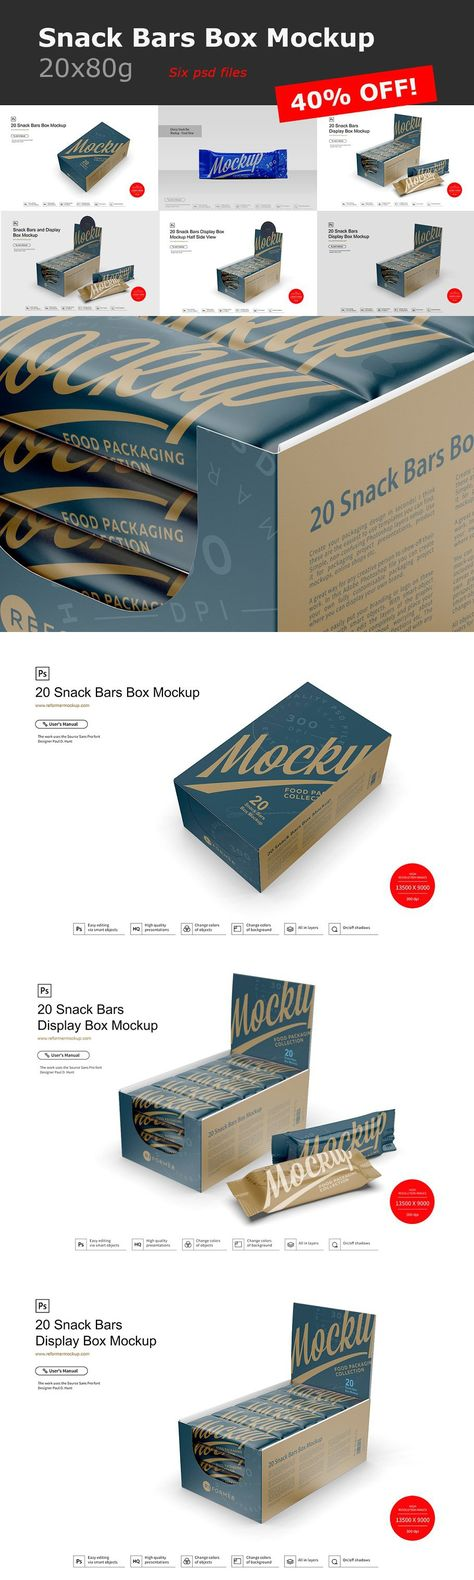 Snack Bars Box Mockup 20x80g